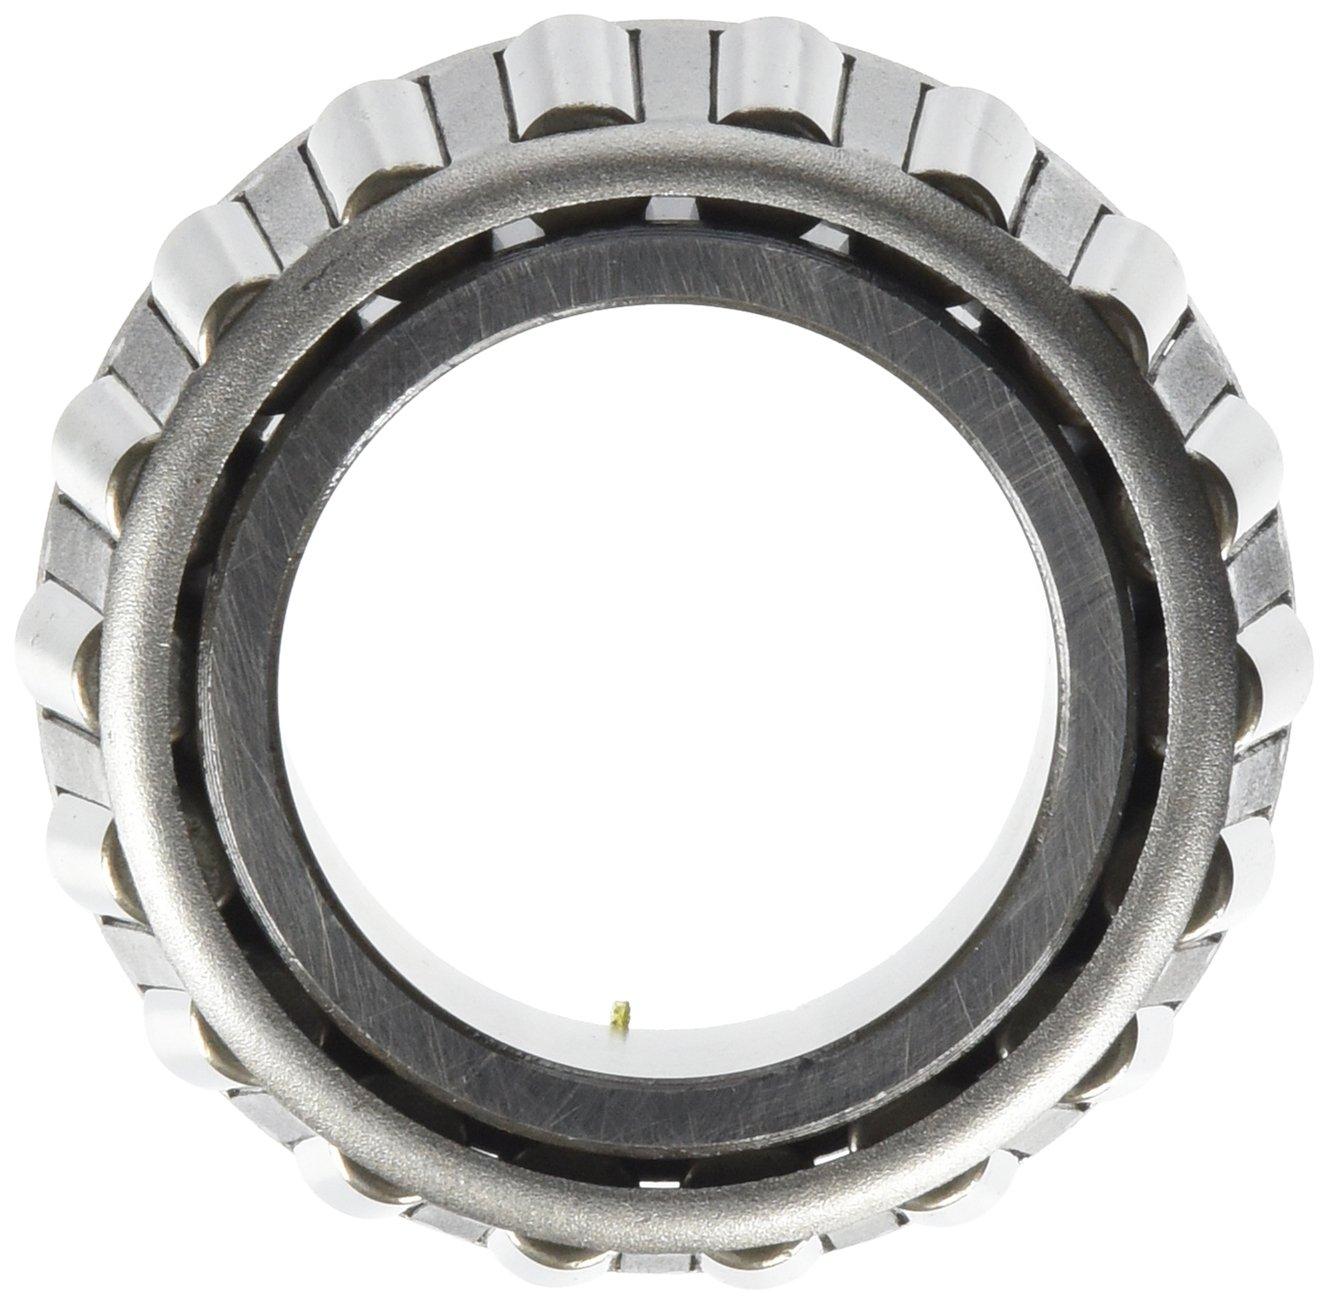 Timken 25580 Axle Bearing by Timken